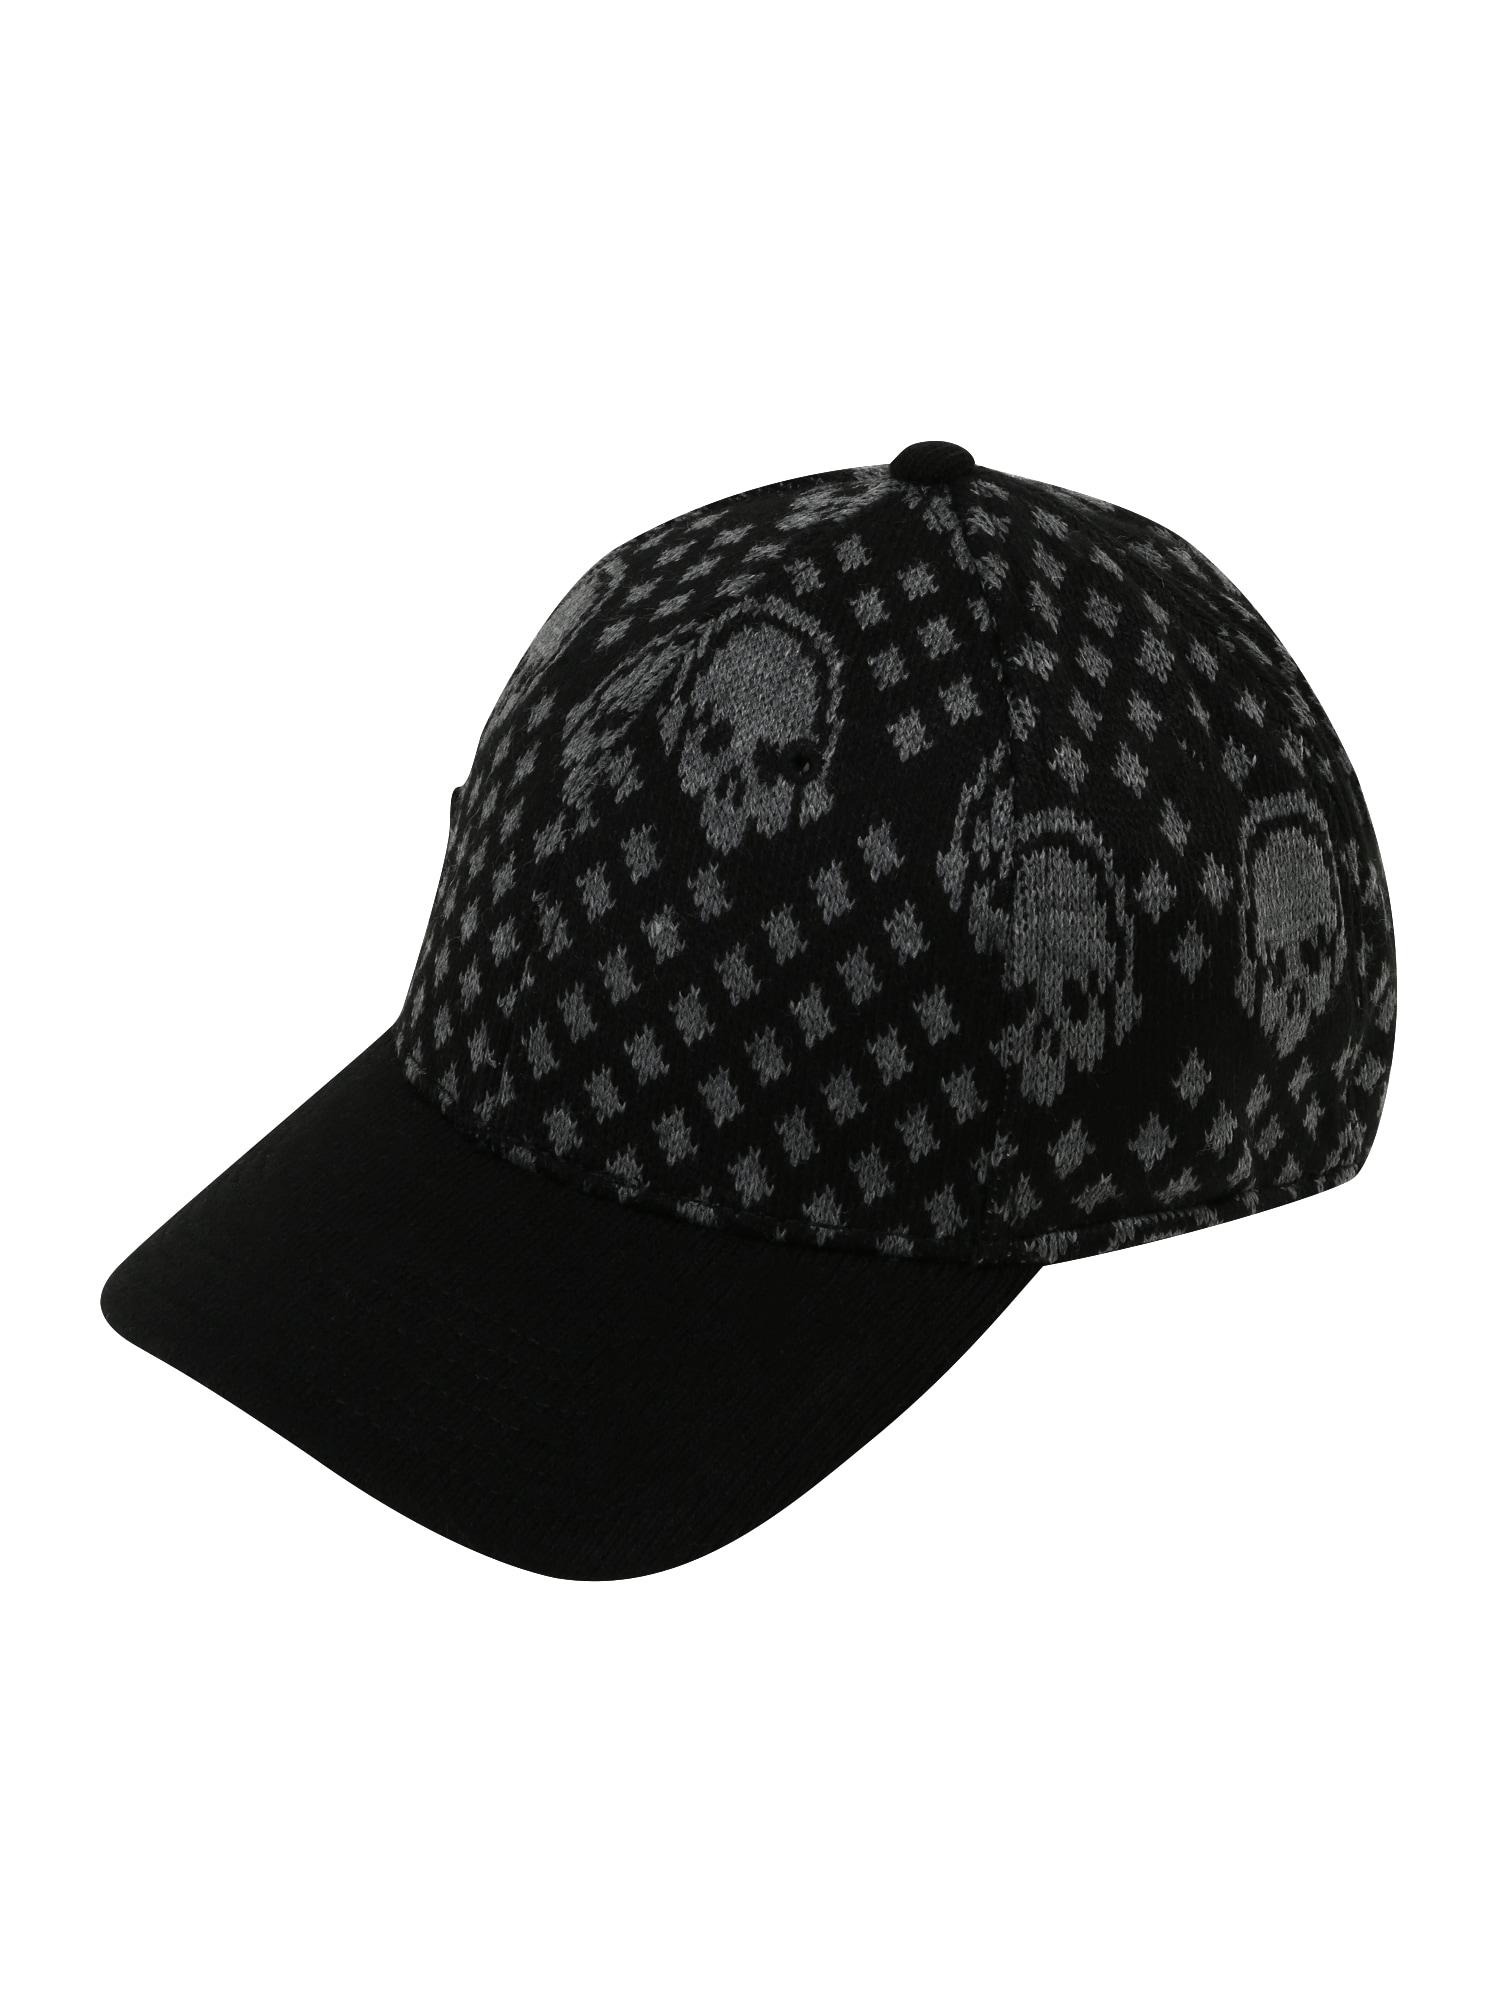 BRUNO BANANI Kepurė juoda / margai pilka